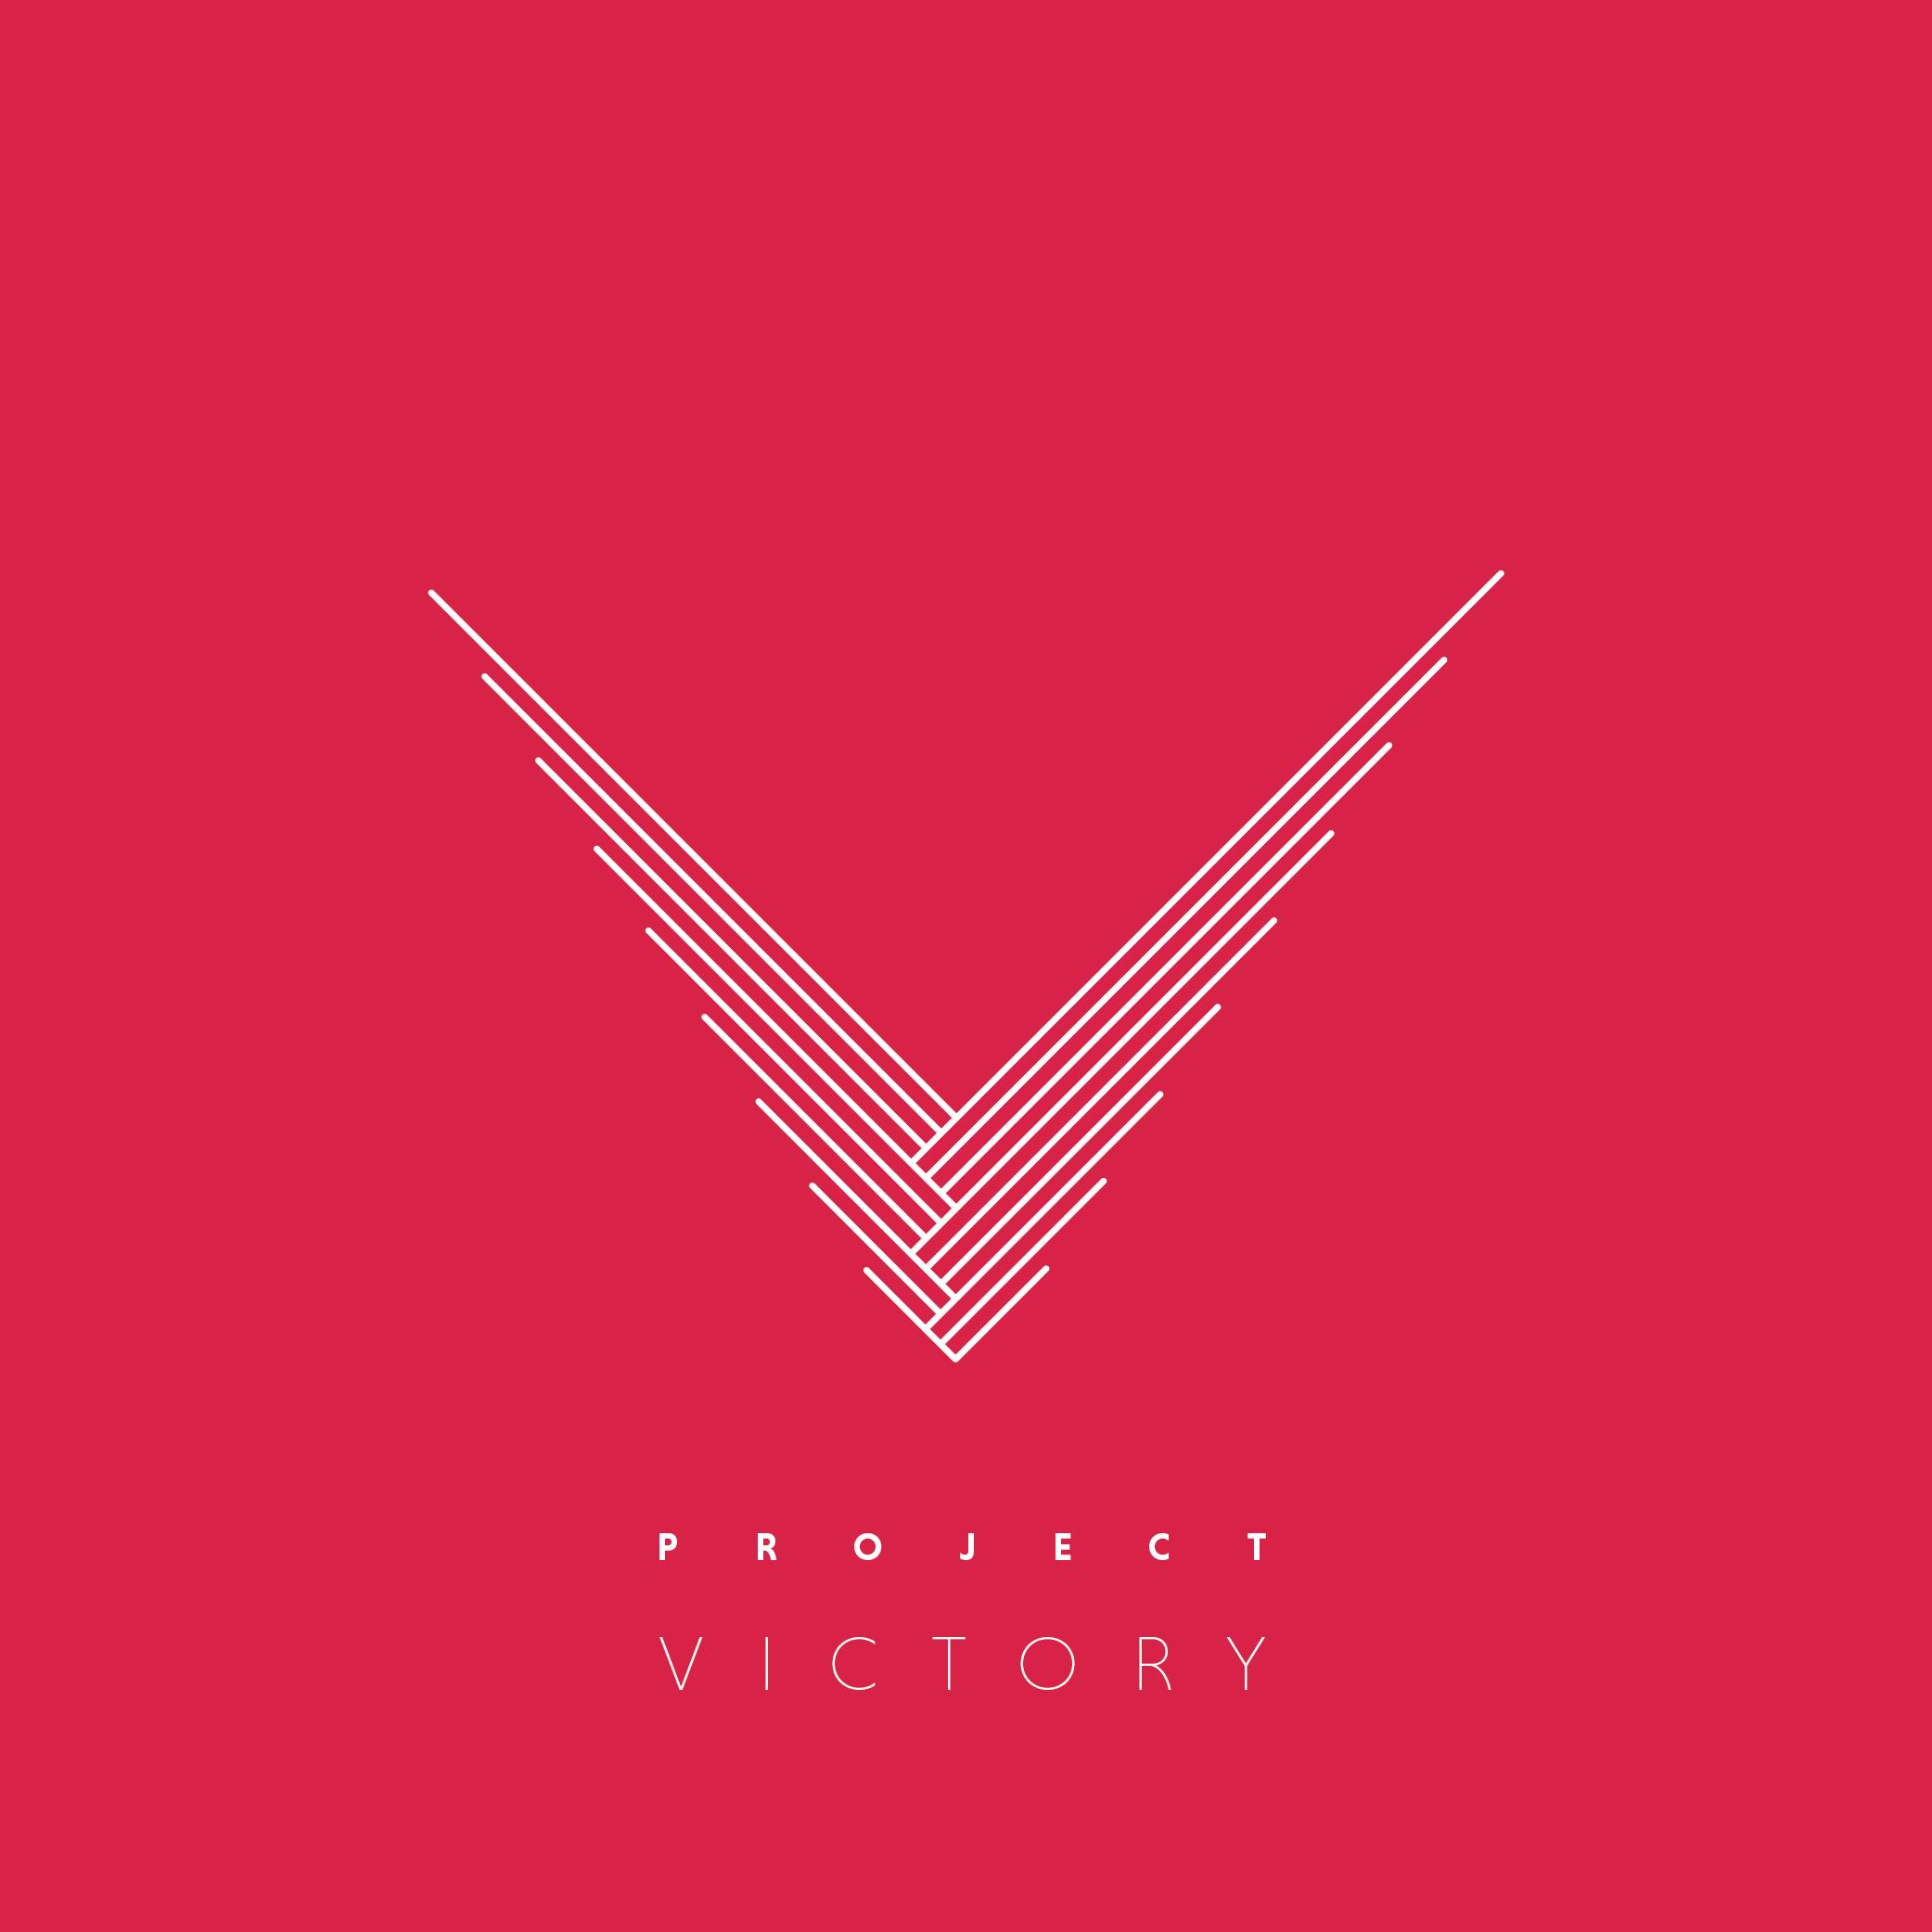 project_victory_branding_logo_03